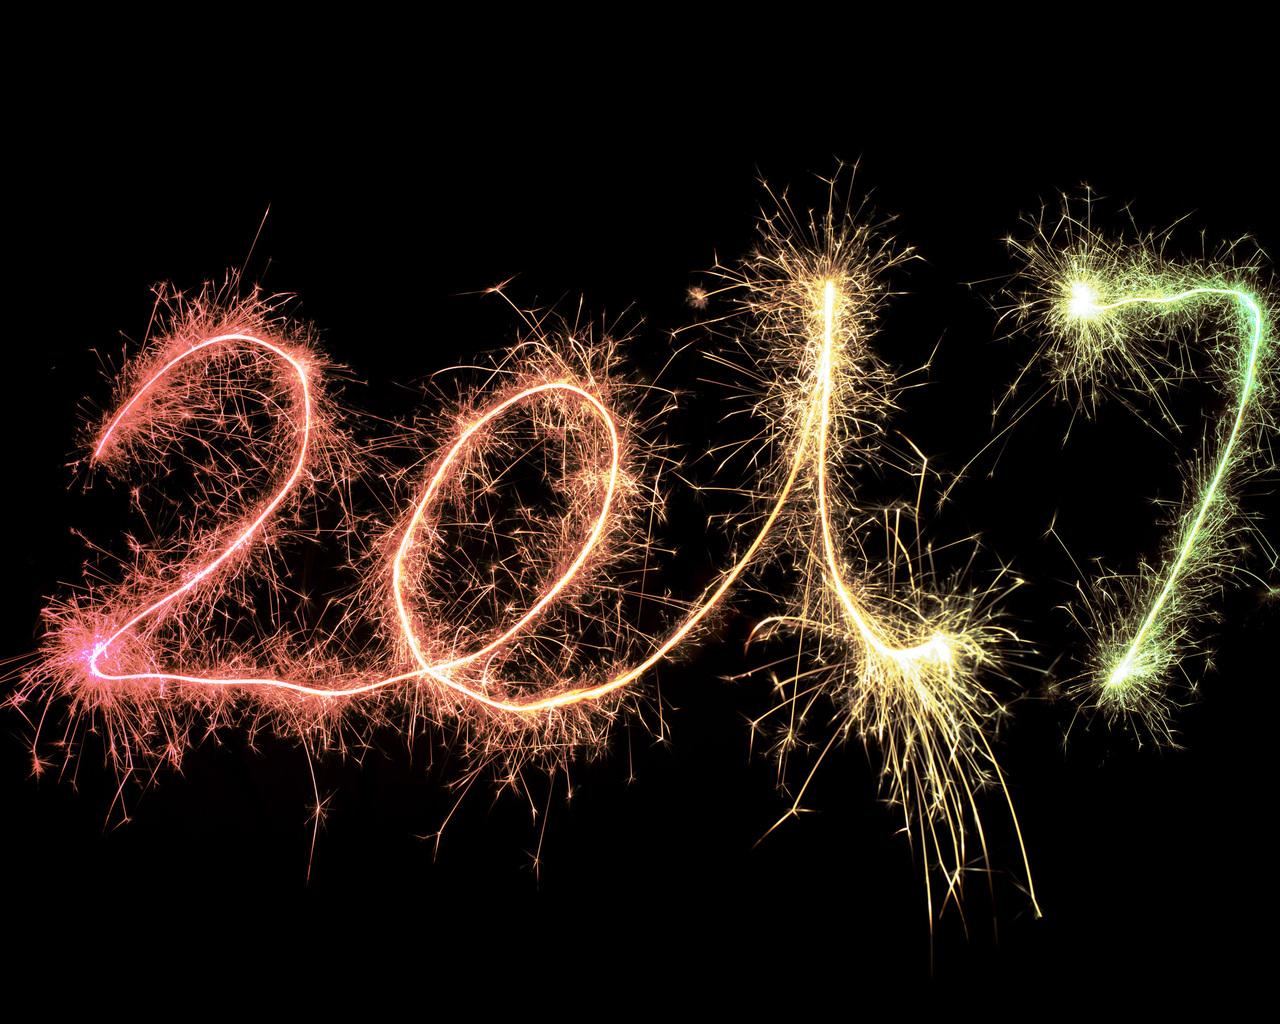 1280x1024 Happy New Year 2017 1280x1024 Resolution HD 4k